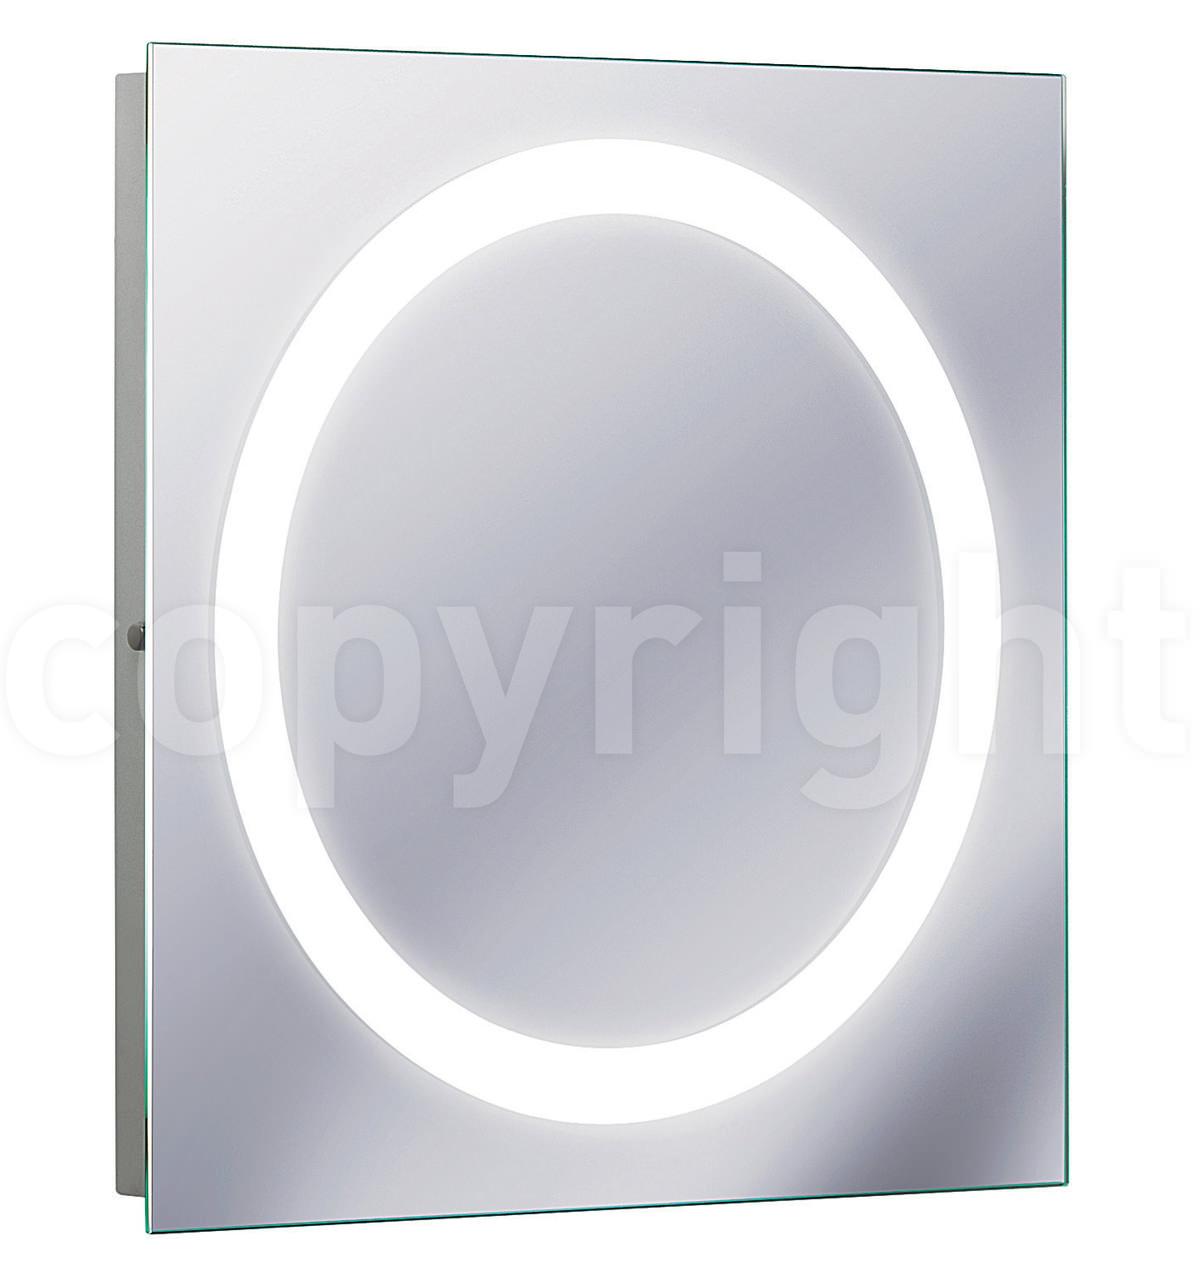 Bauhaus edge illuminated mirror 550 x 550mm mf5555a for Illuminated mirrors